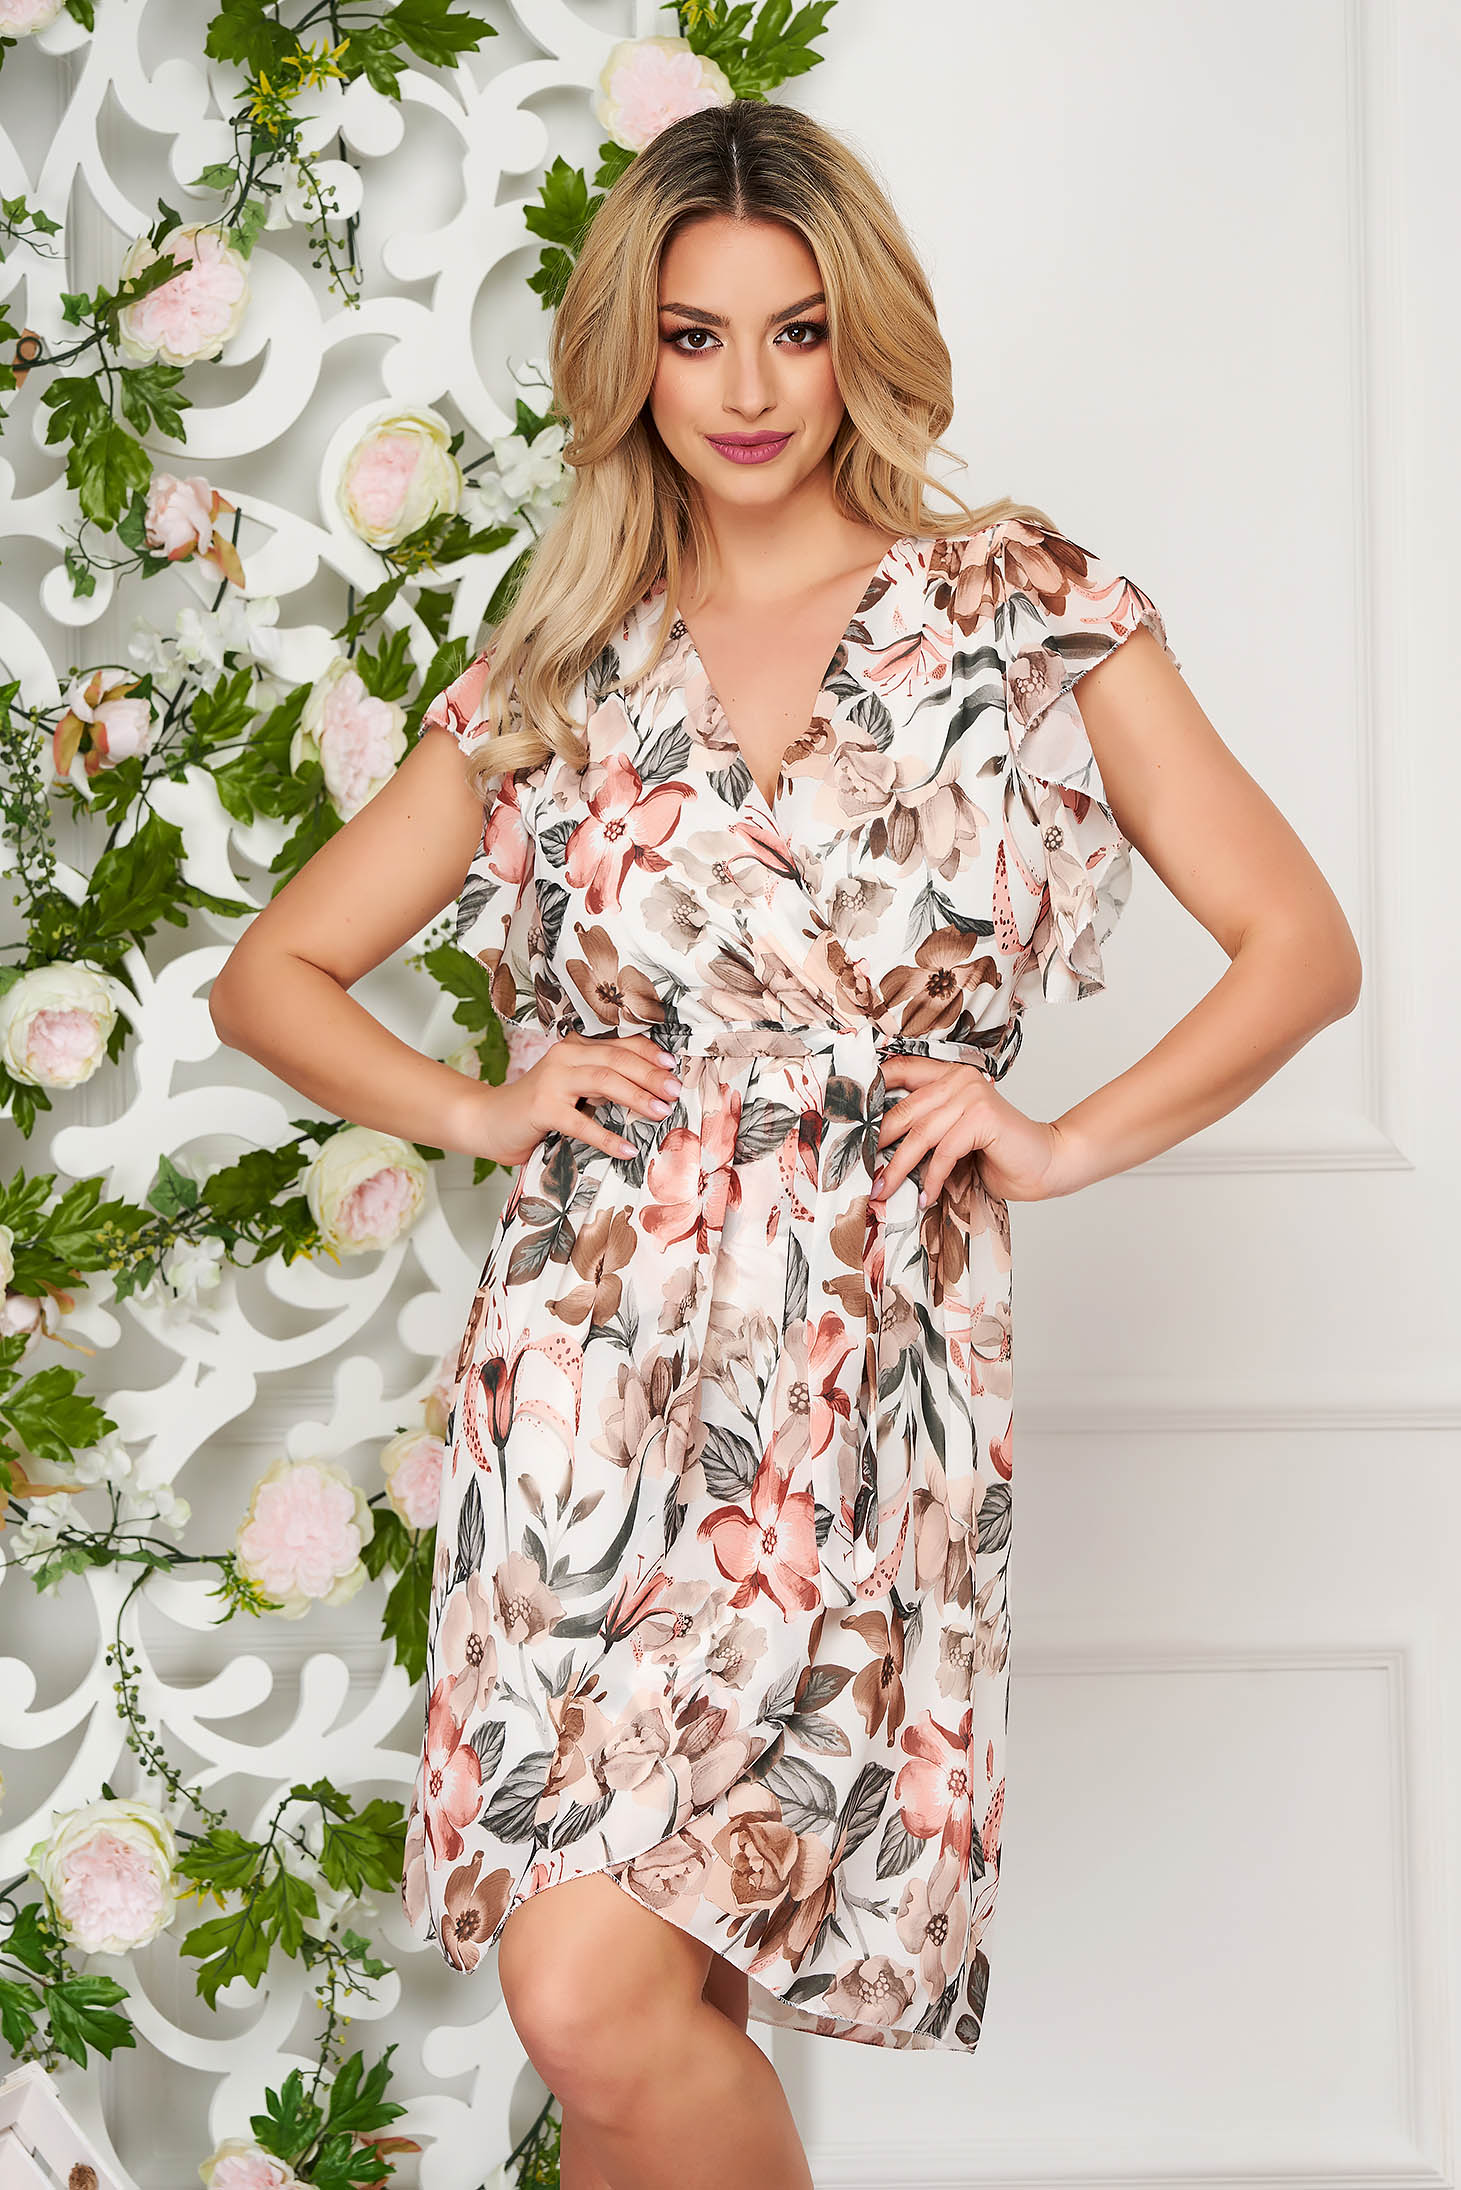 Cream dress short cut daily cloche thin fabric wrap over skirt